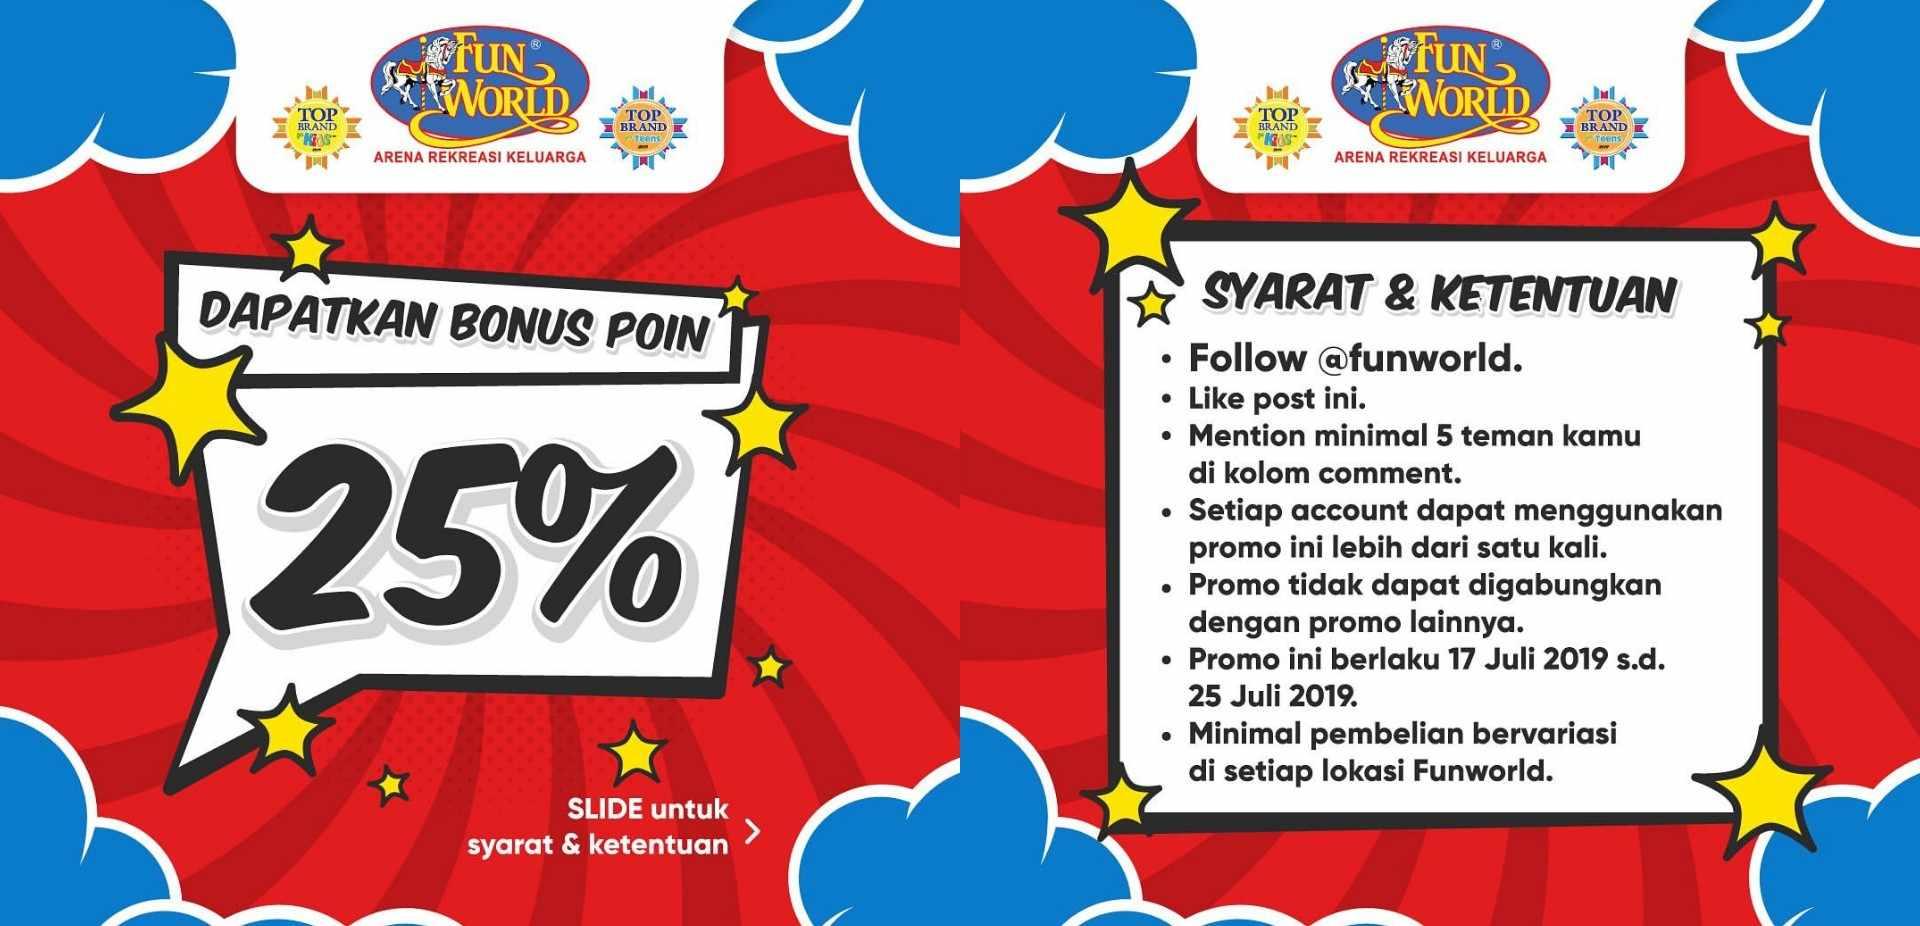 Diskon Fun World Bonus Poin hingga 25%